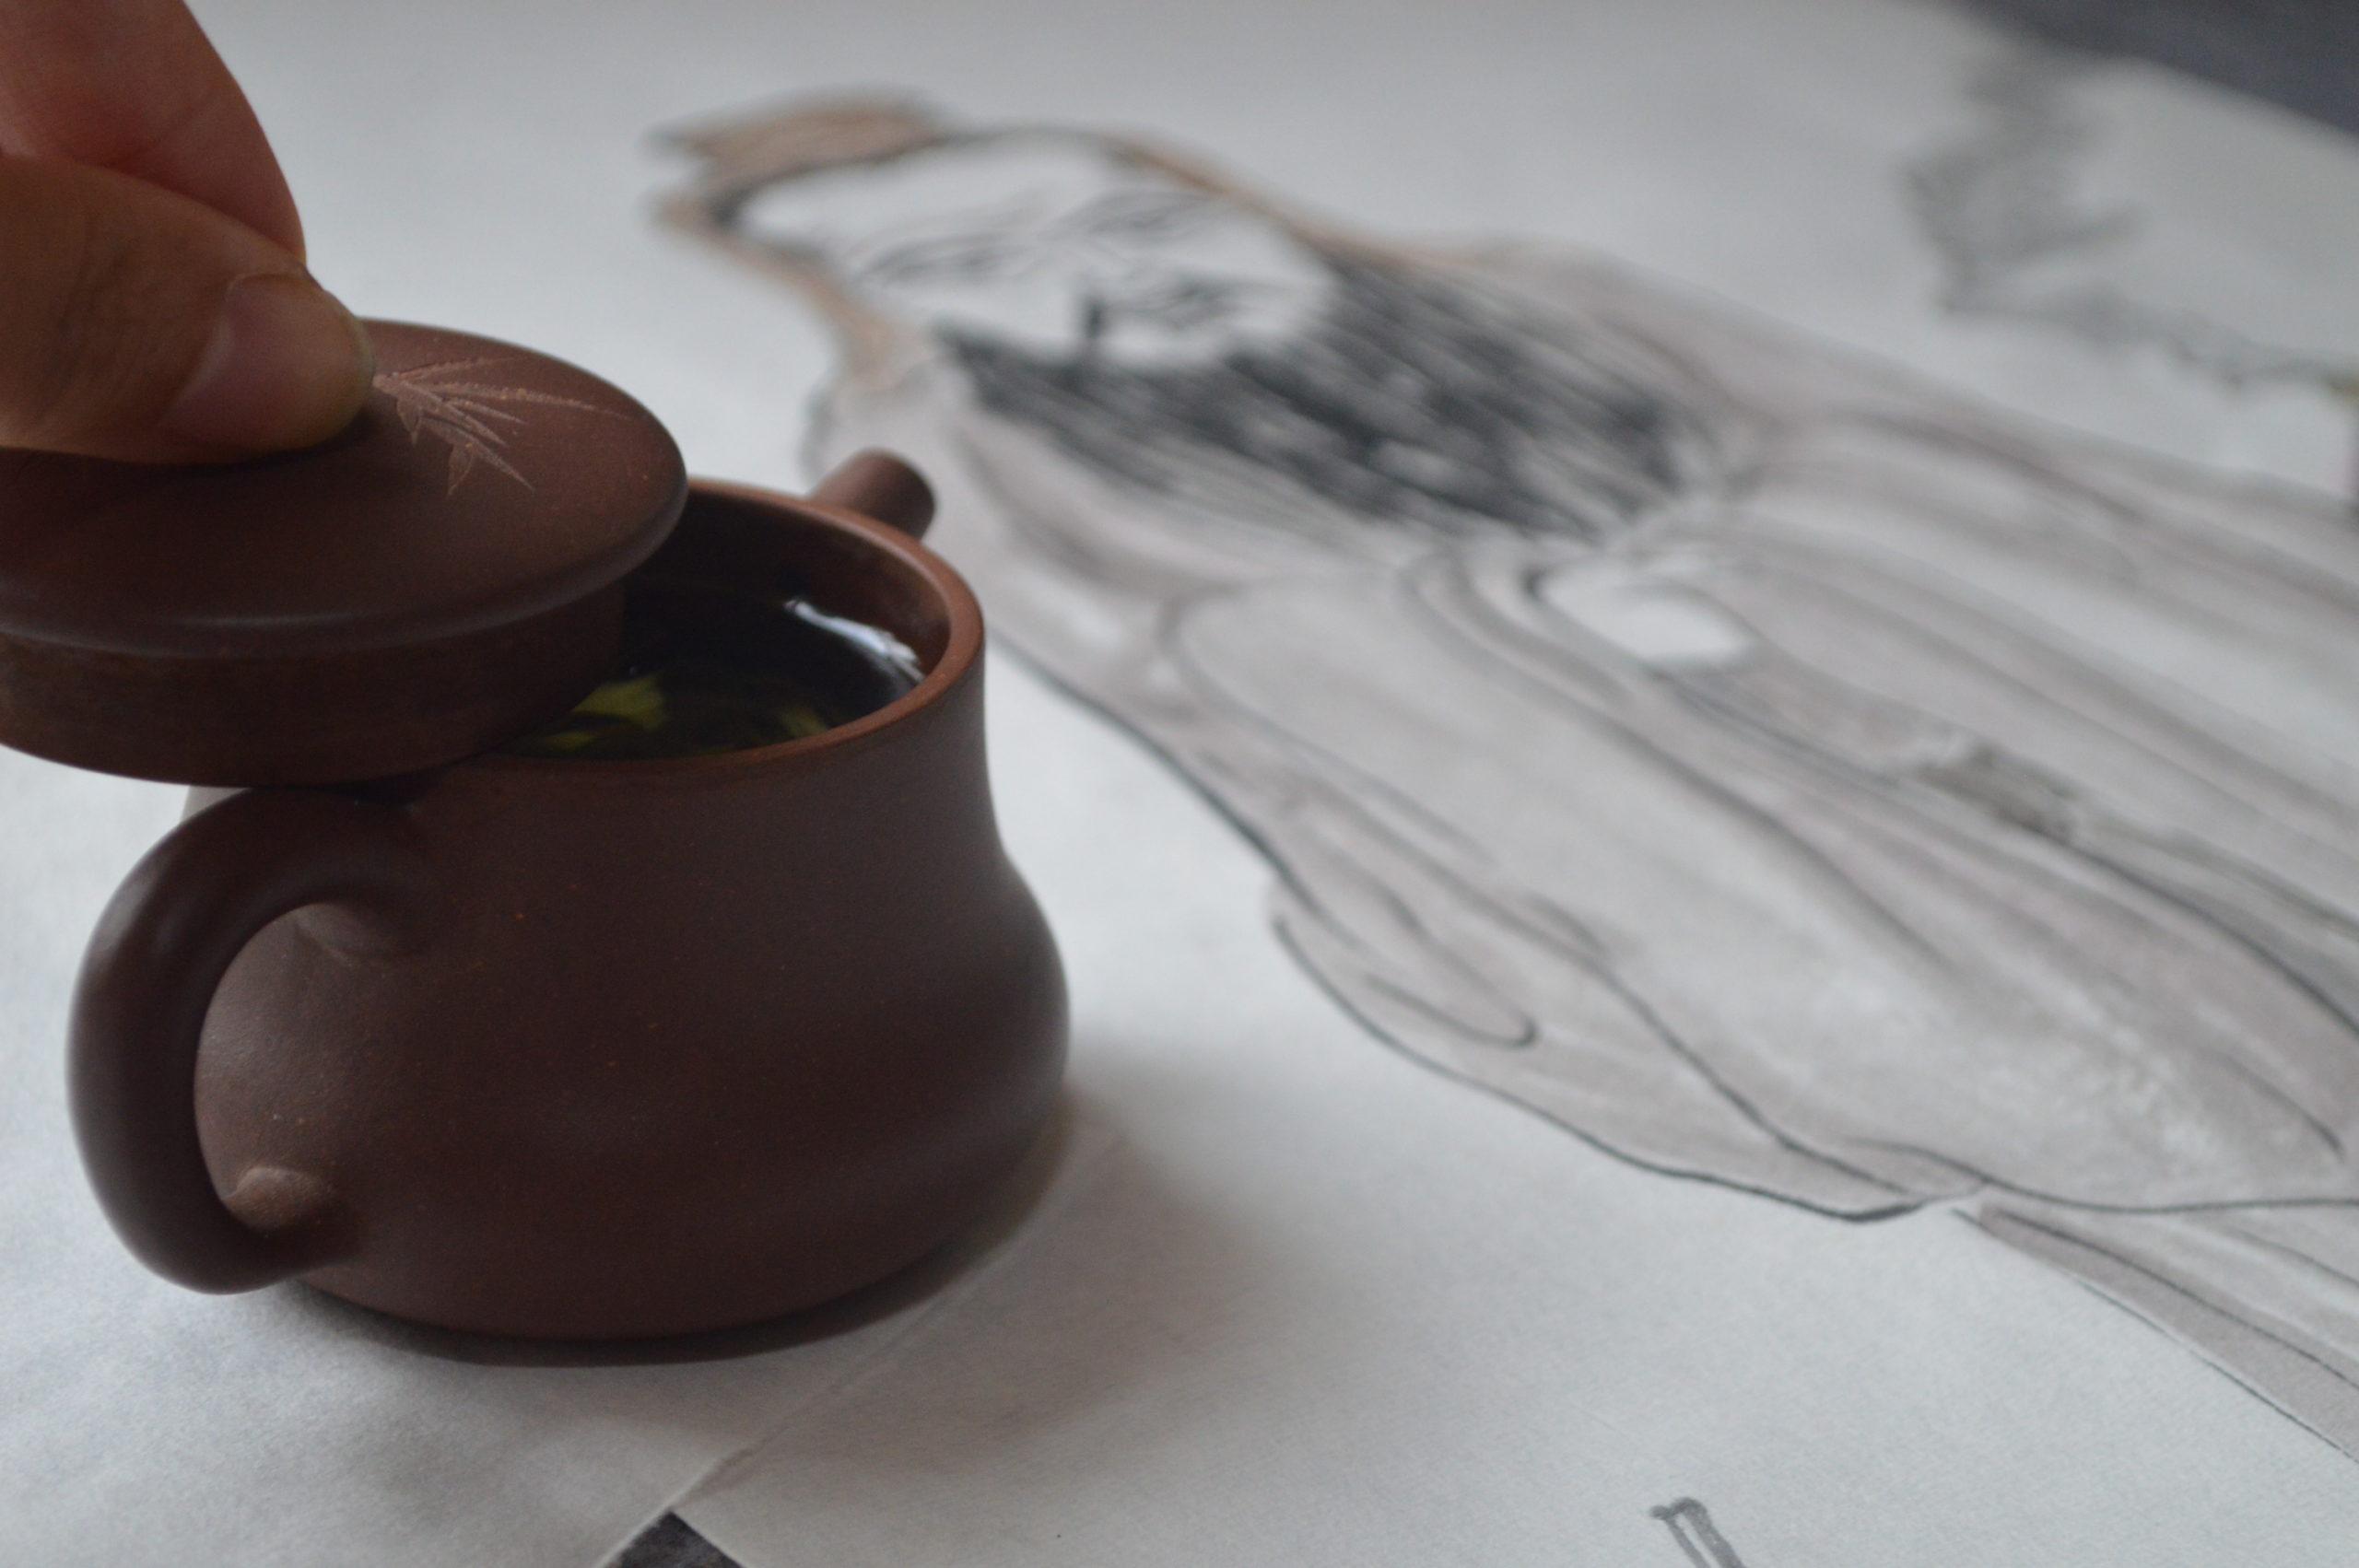 https://shop.liu-tea-art.com/wp-content/uploads/2020/08/DSC_0076-scaled.jpg